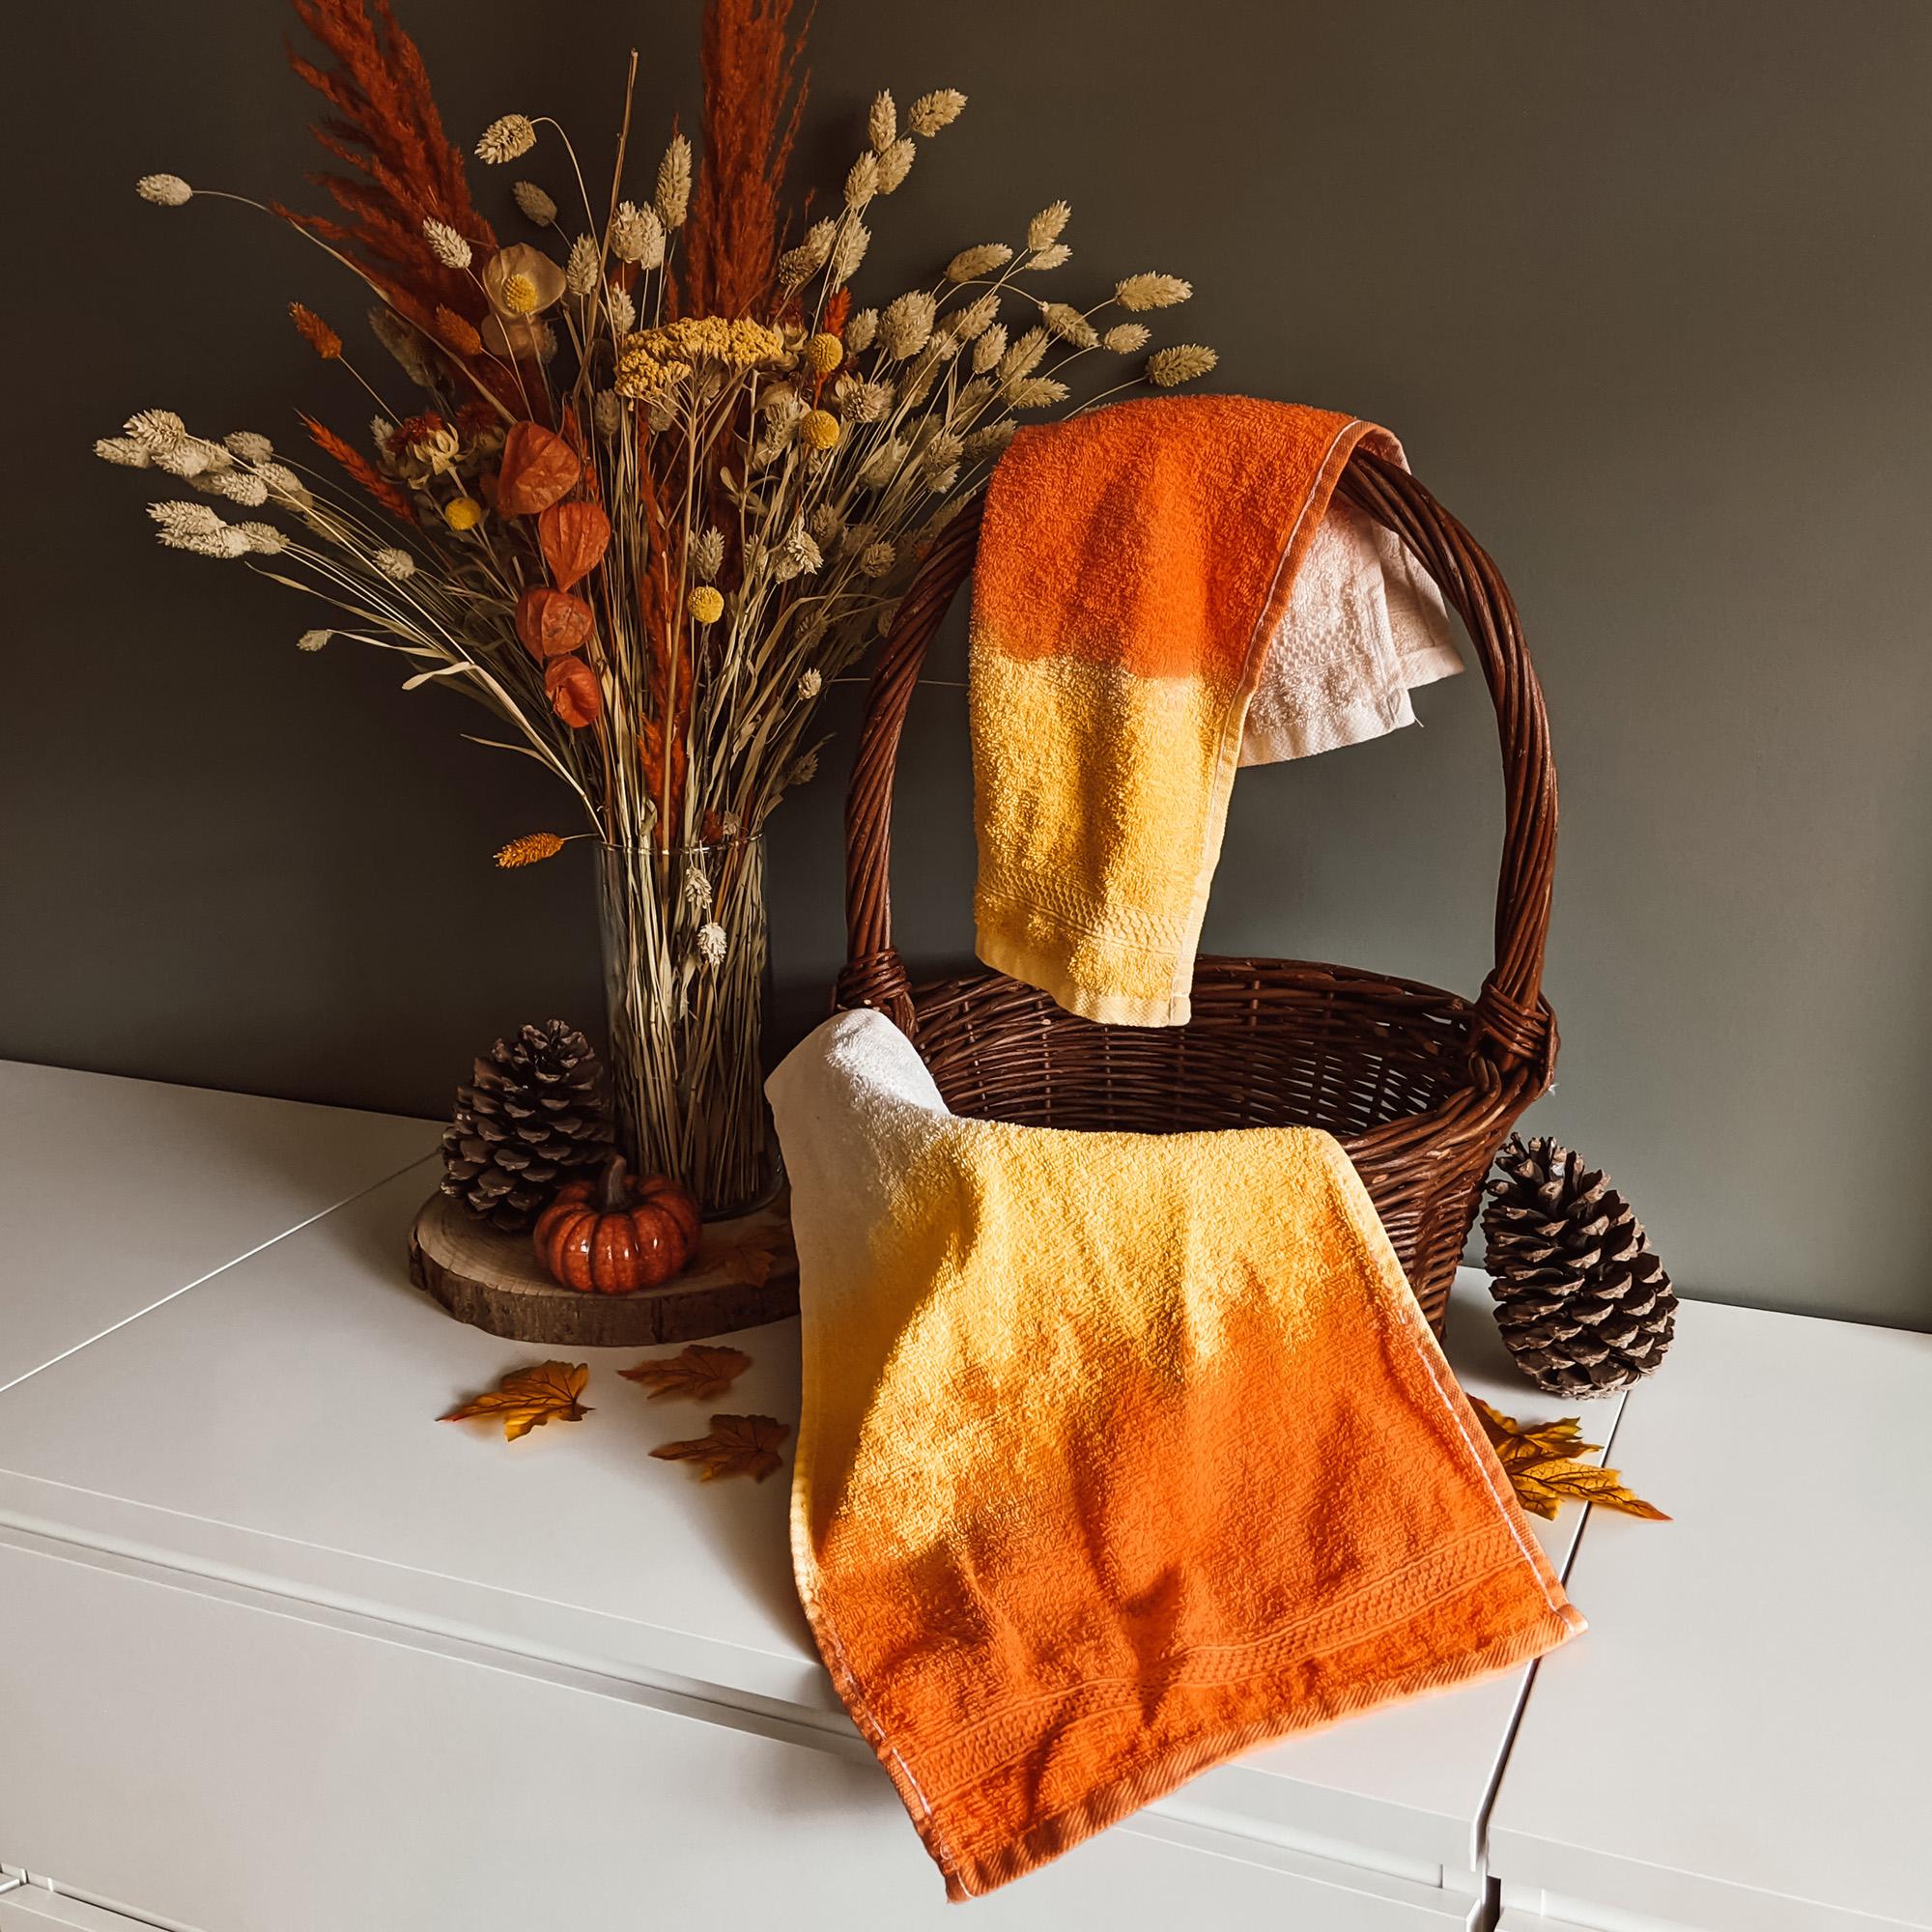 Candy Corn Halloween handdoekjes